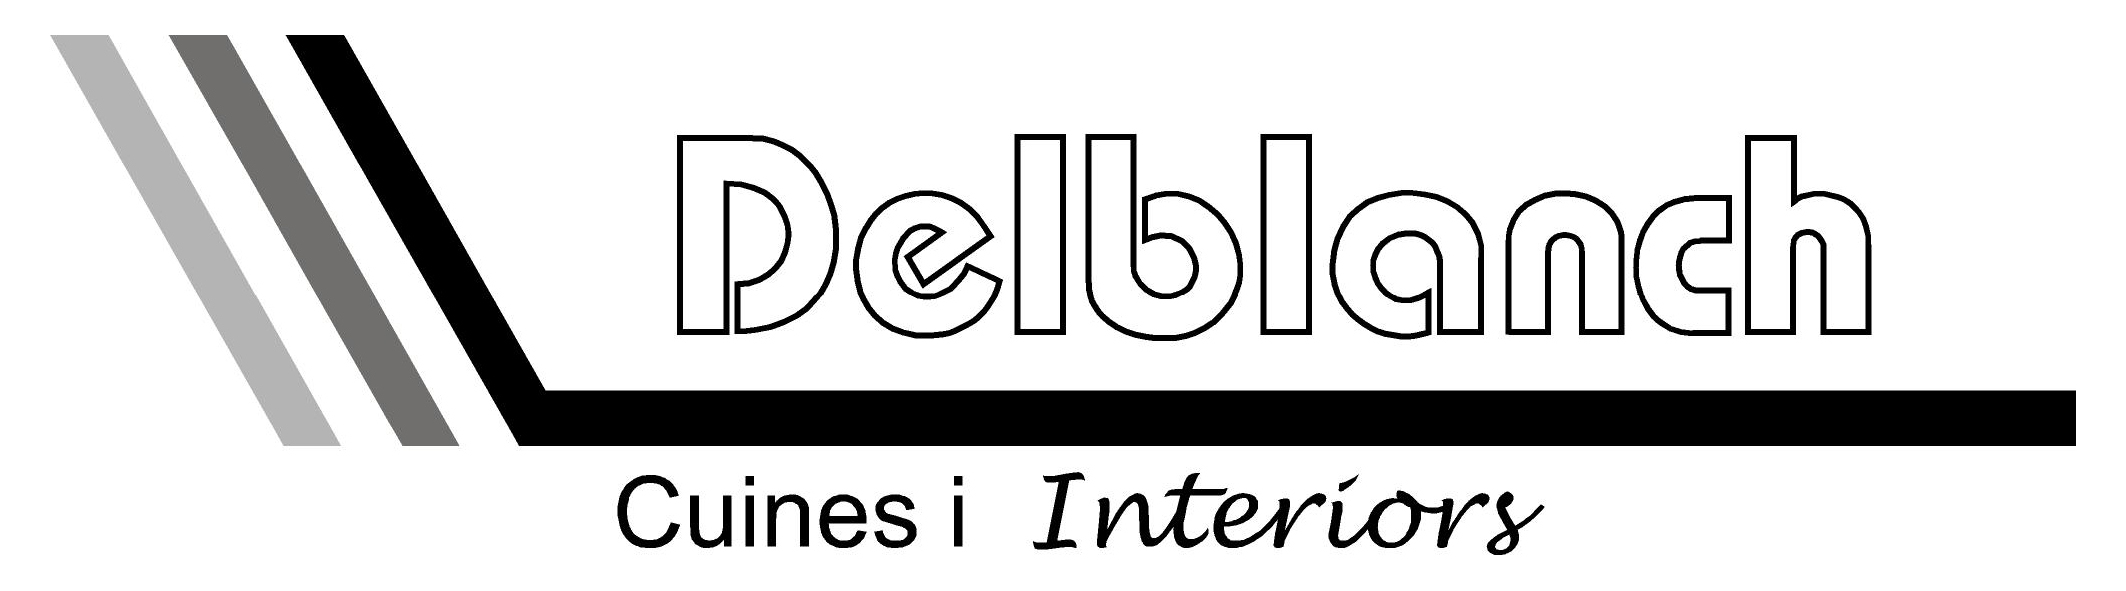 Delblanch Cuines i Interiors